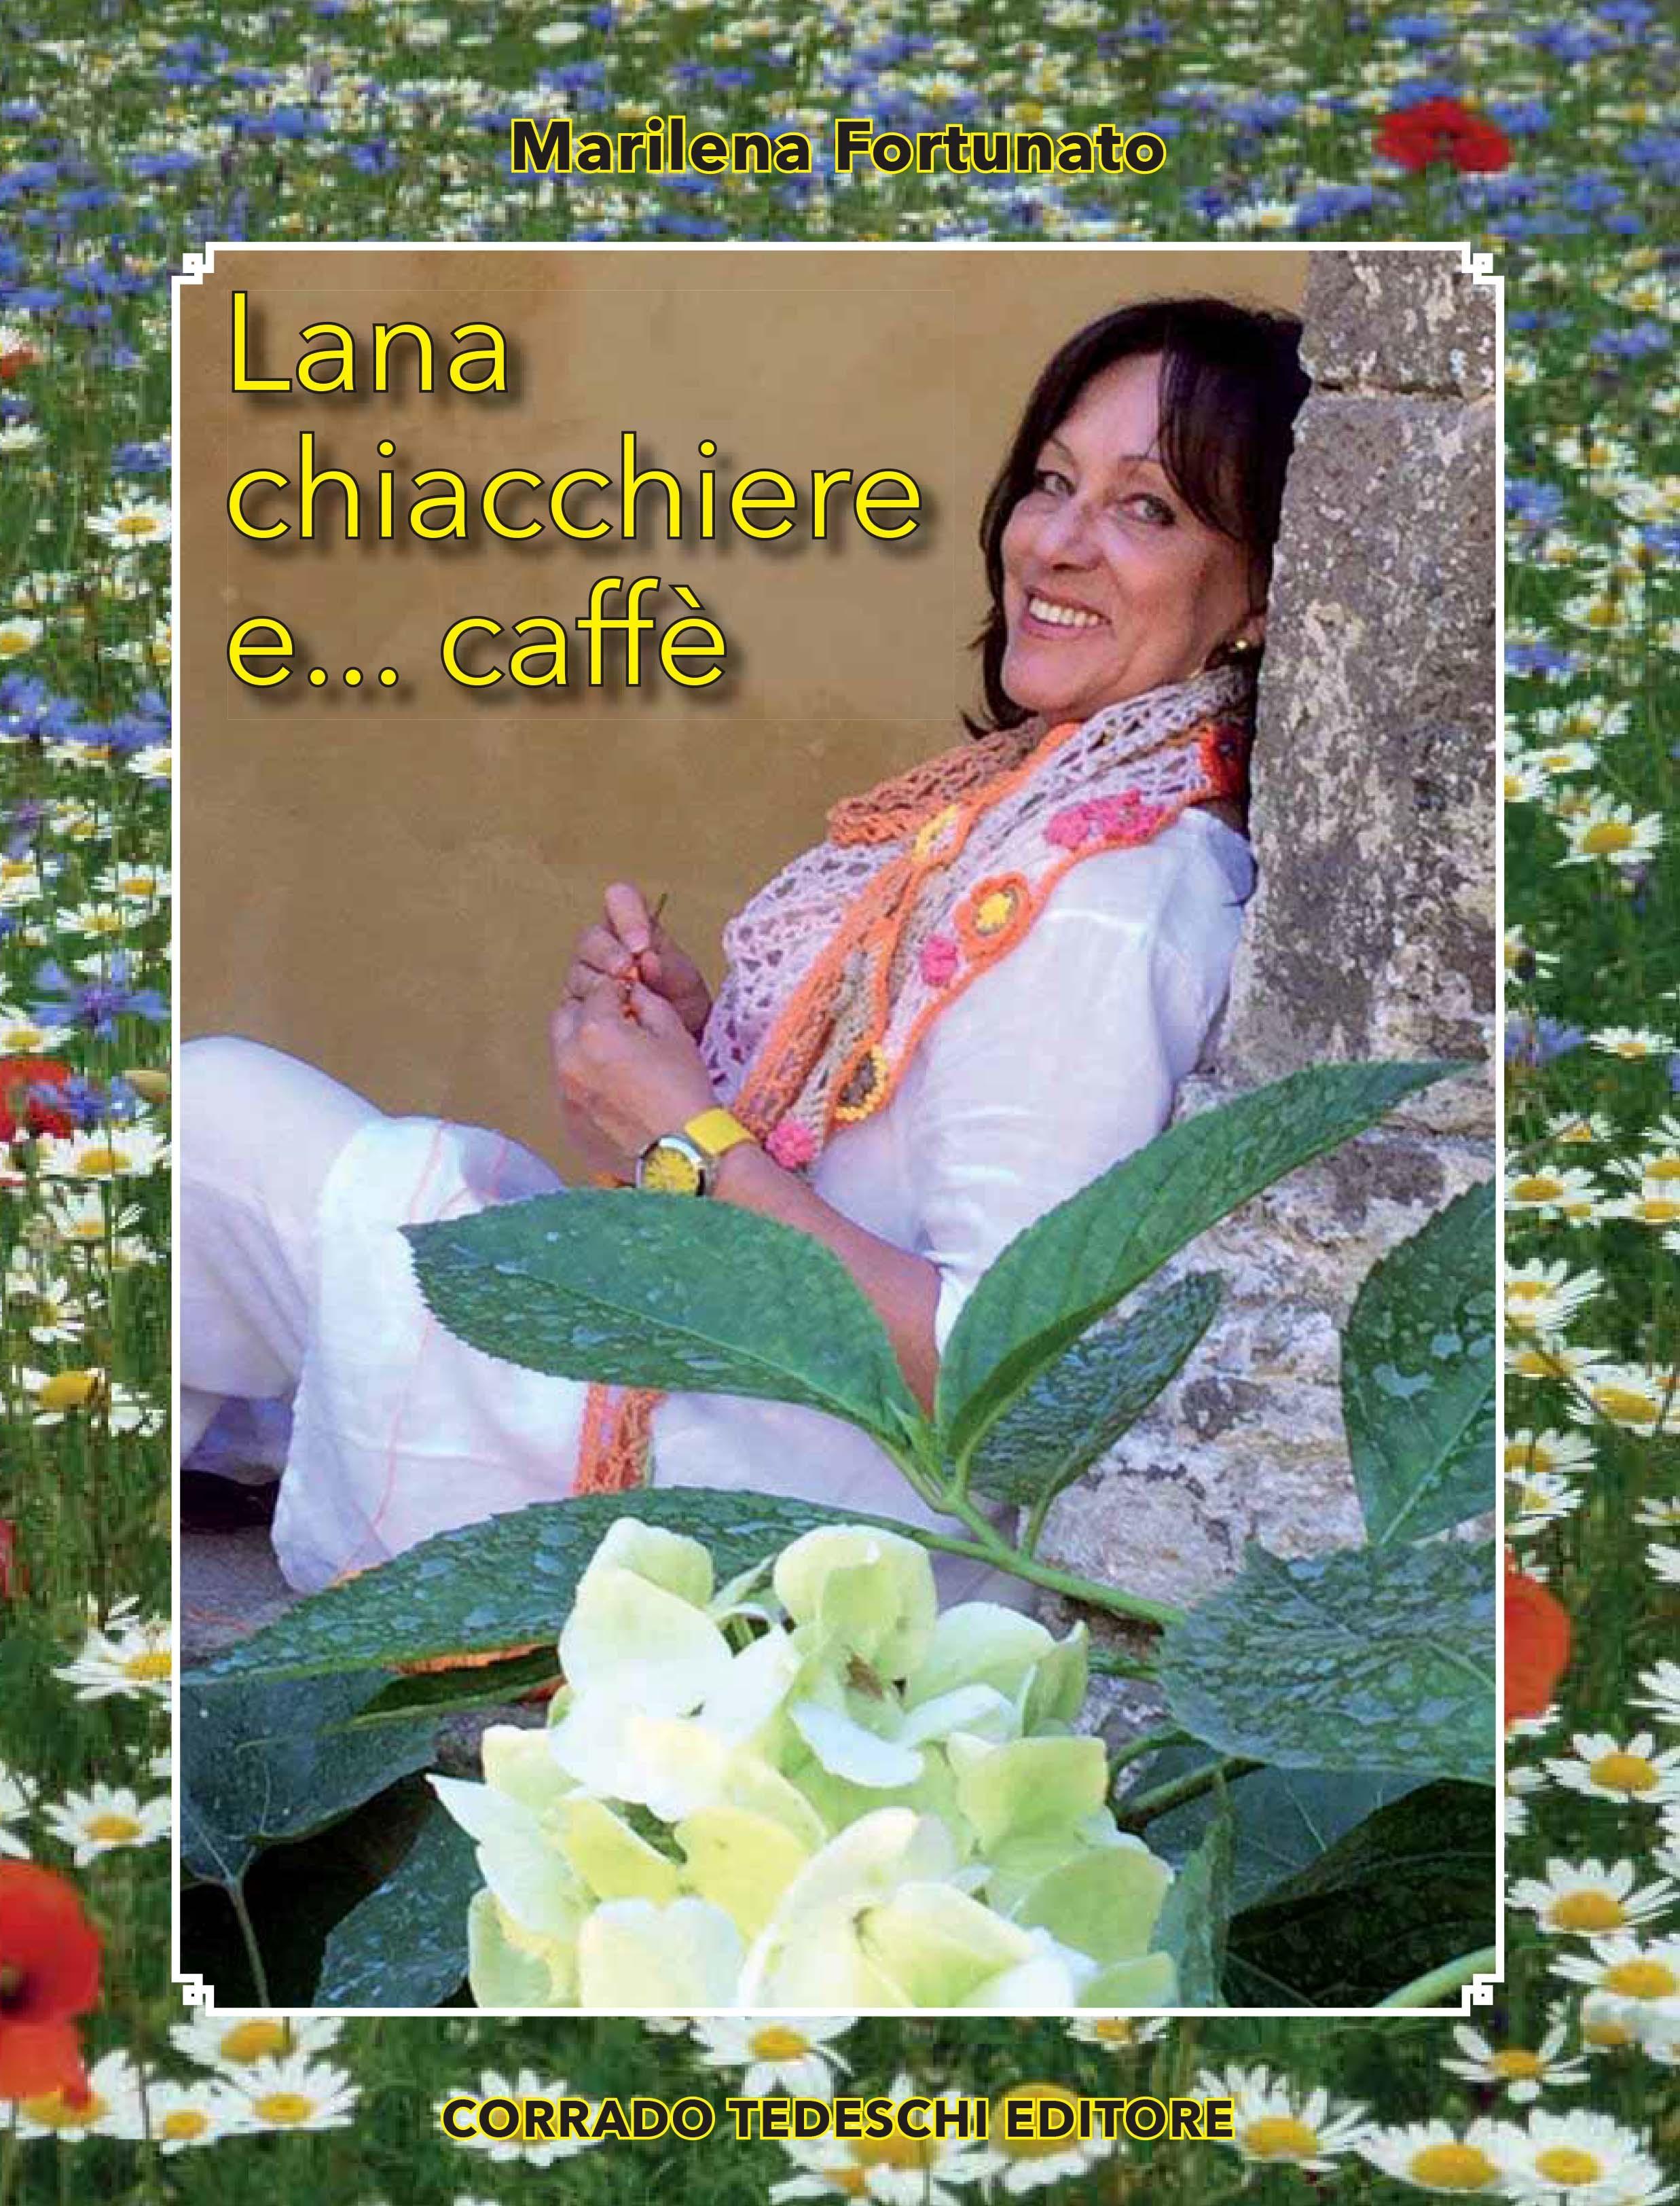 E Caffè Kindle Editore Tedeschi LanaChiacchiere Corrado yYfgb76